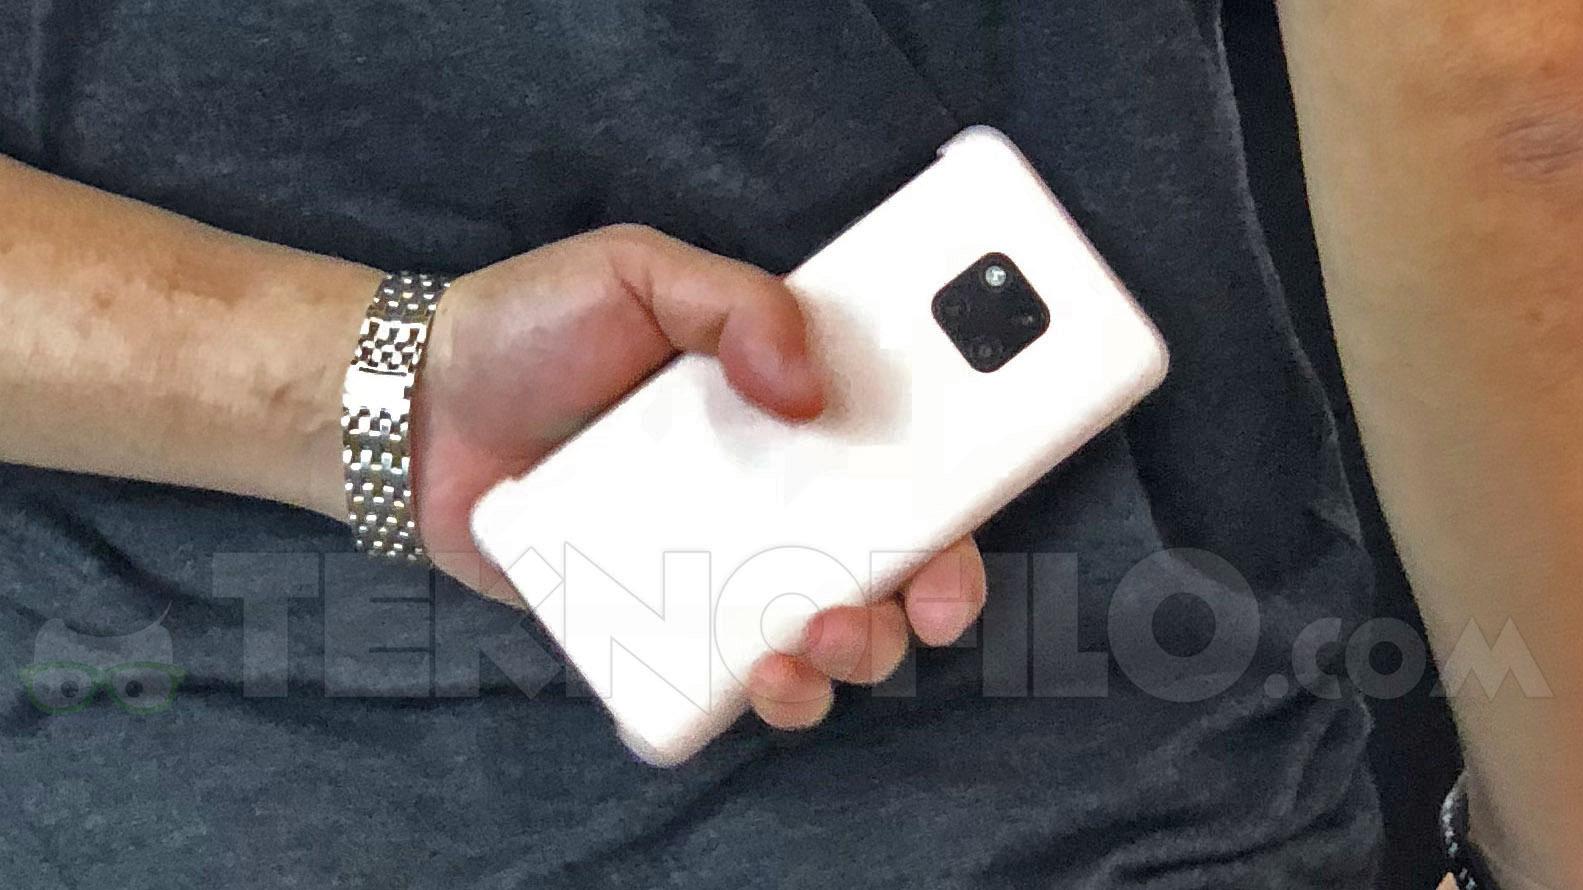 Huawei MATE 20 Pro Functia IMAGINI Unitate REALA 1